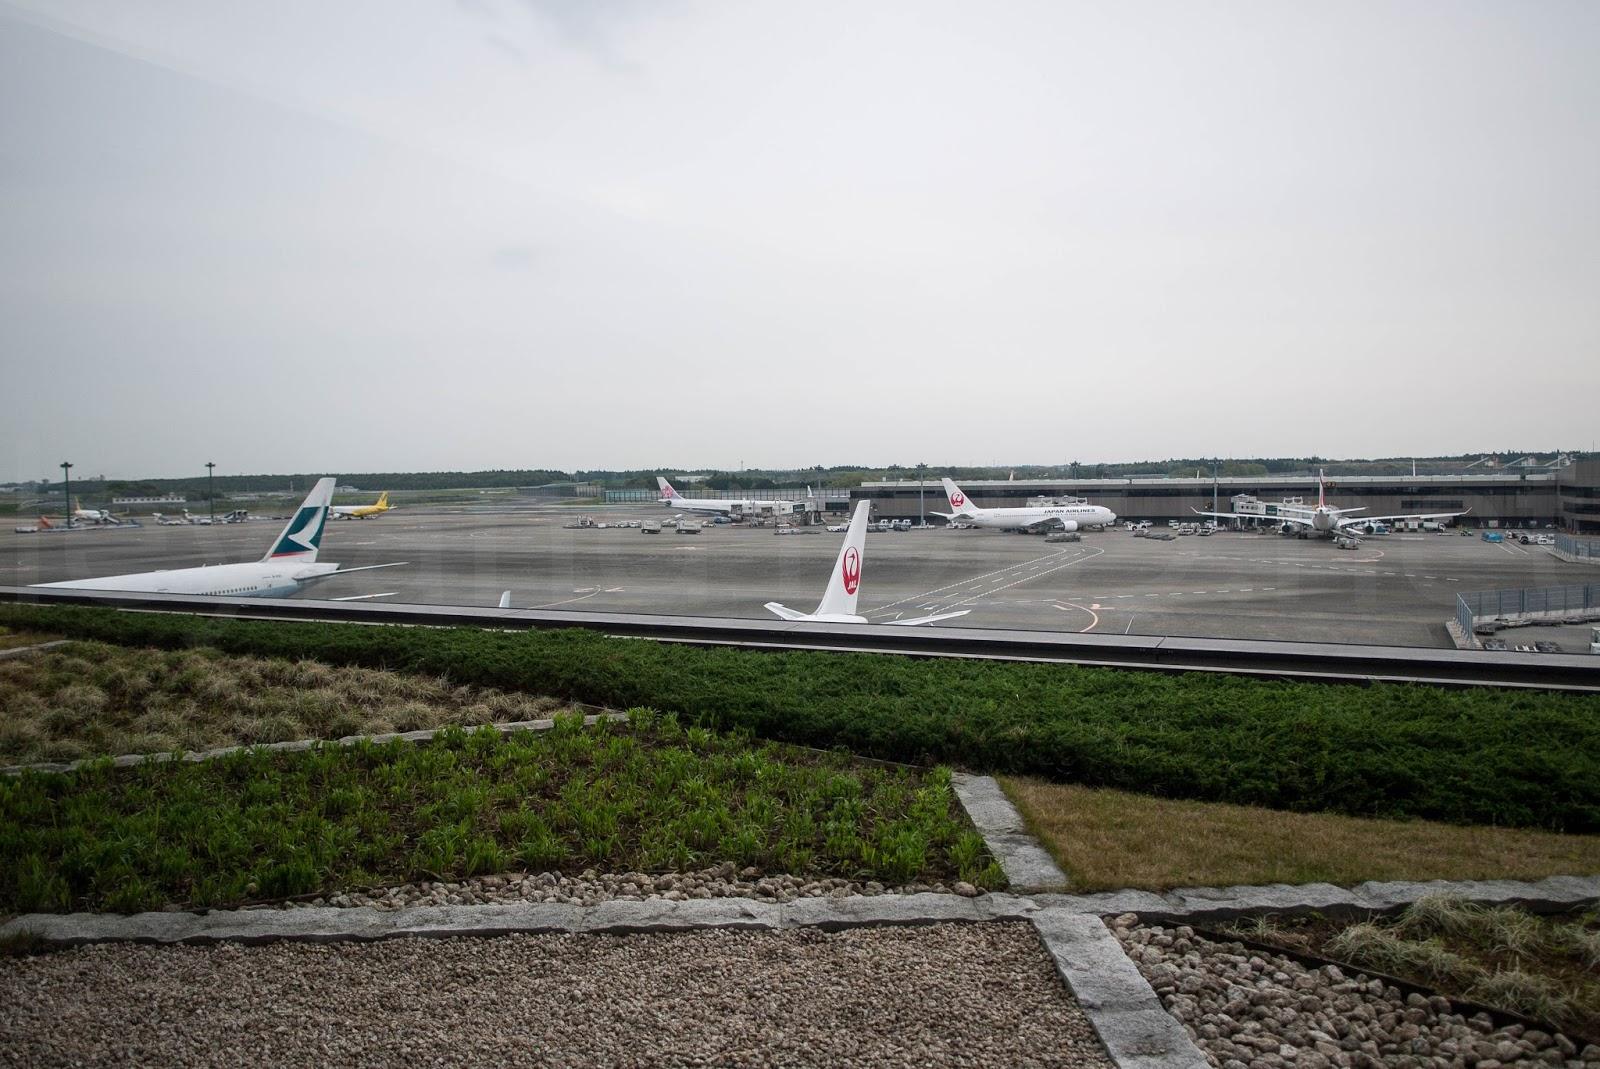 Hotels Near Narita International Airport (NRT) - Find Over